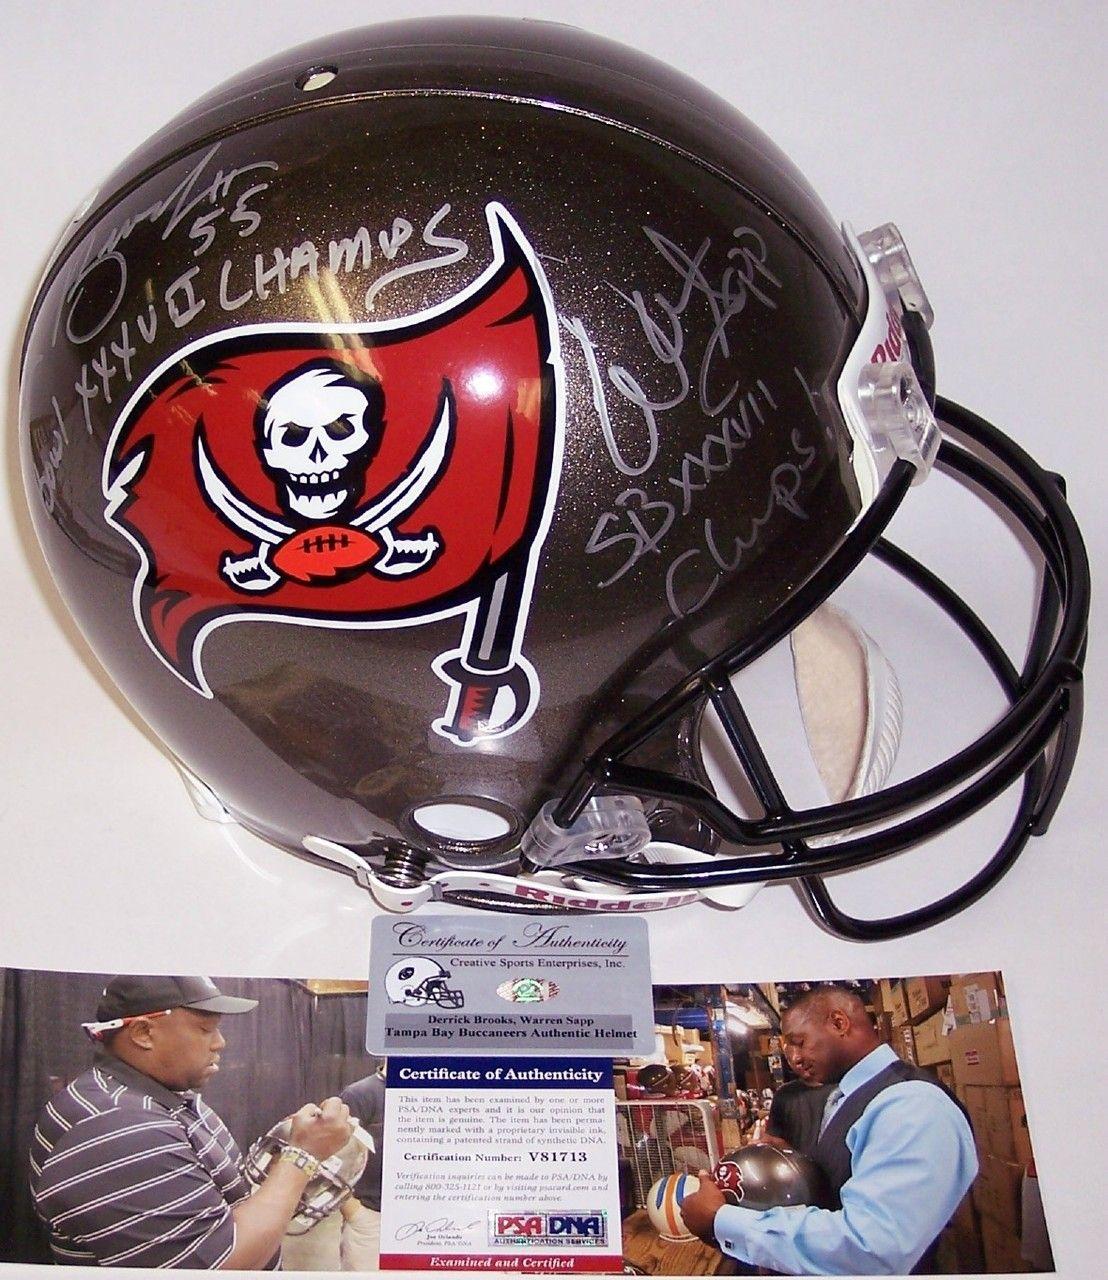 Derrick Brooks and Warren Sapp Autographed Tampa Bay Buccaneers Authentic  Helmet - PSA DNA a6205a014